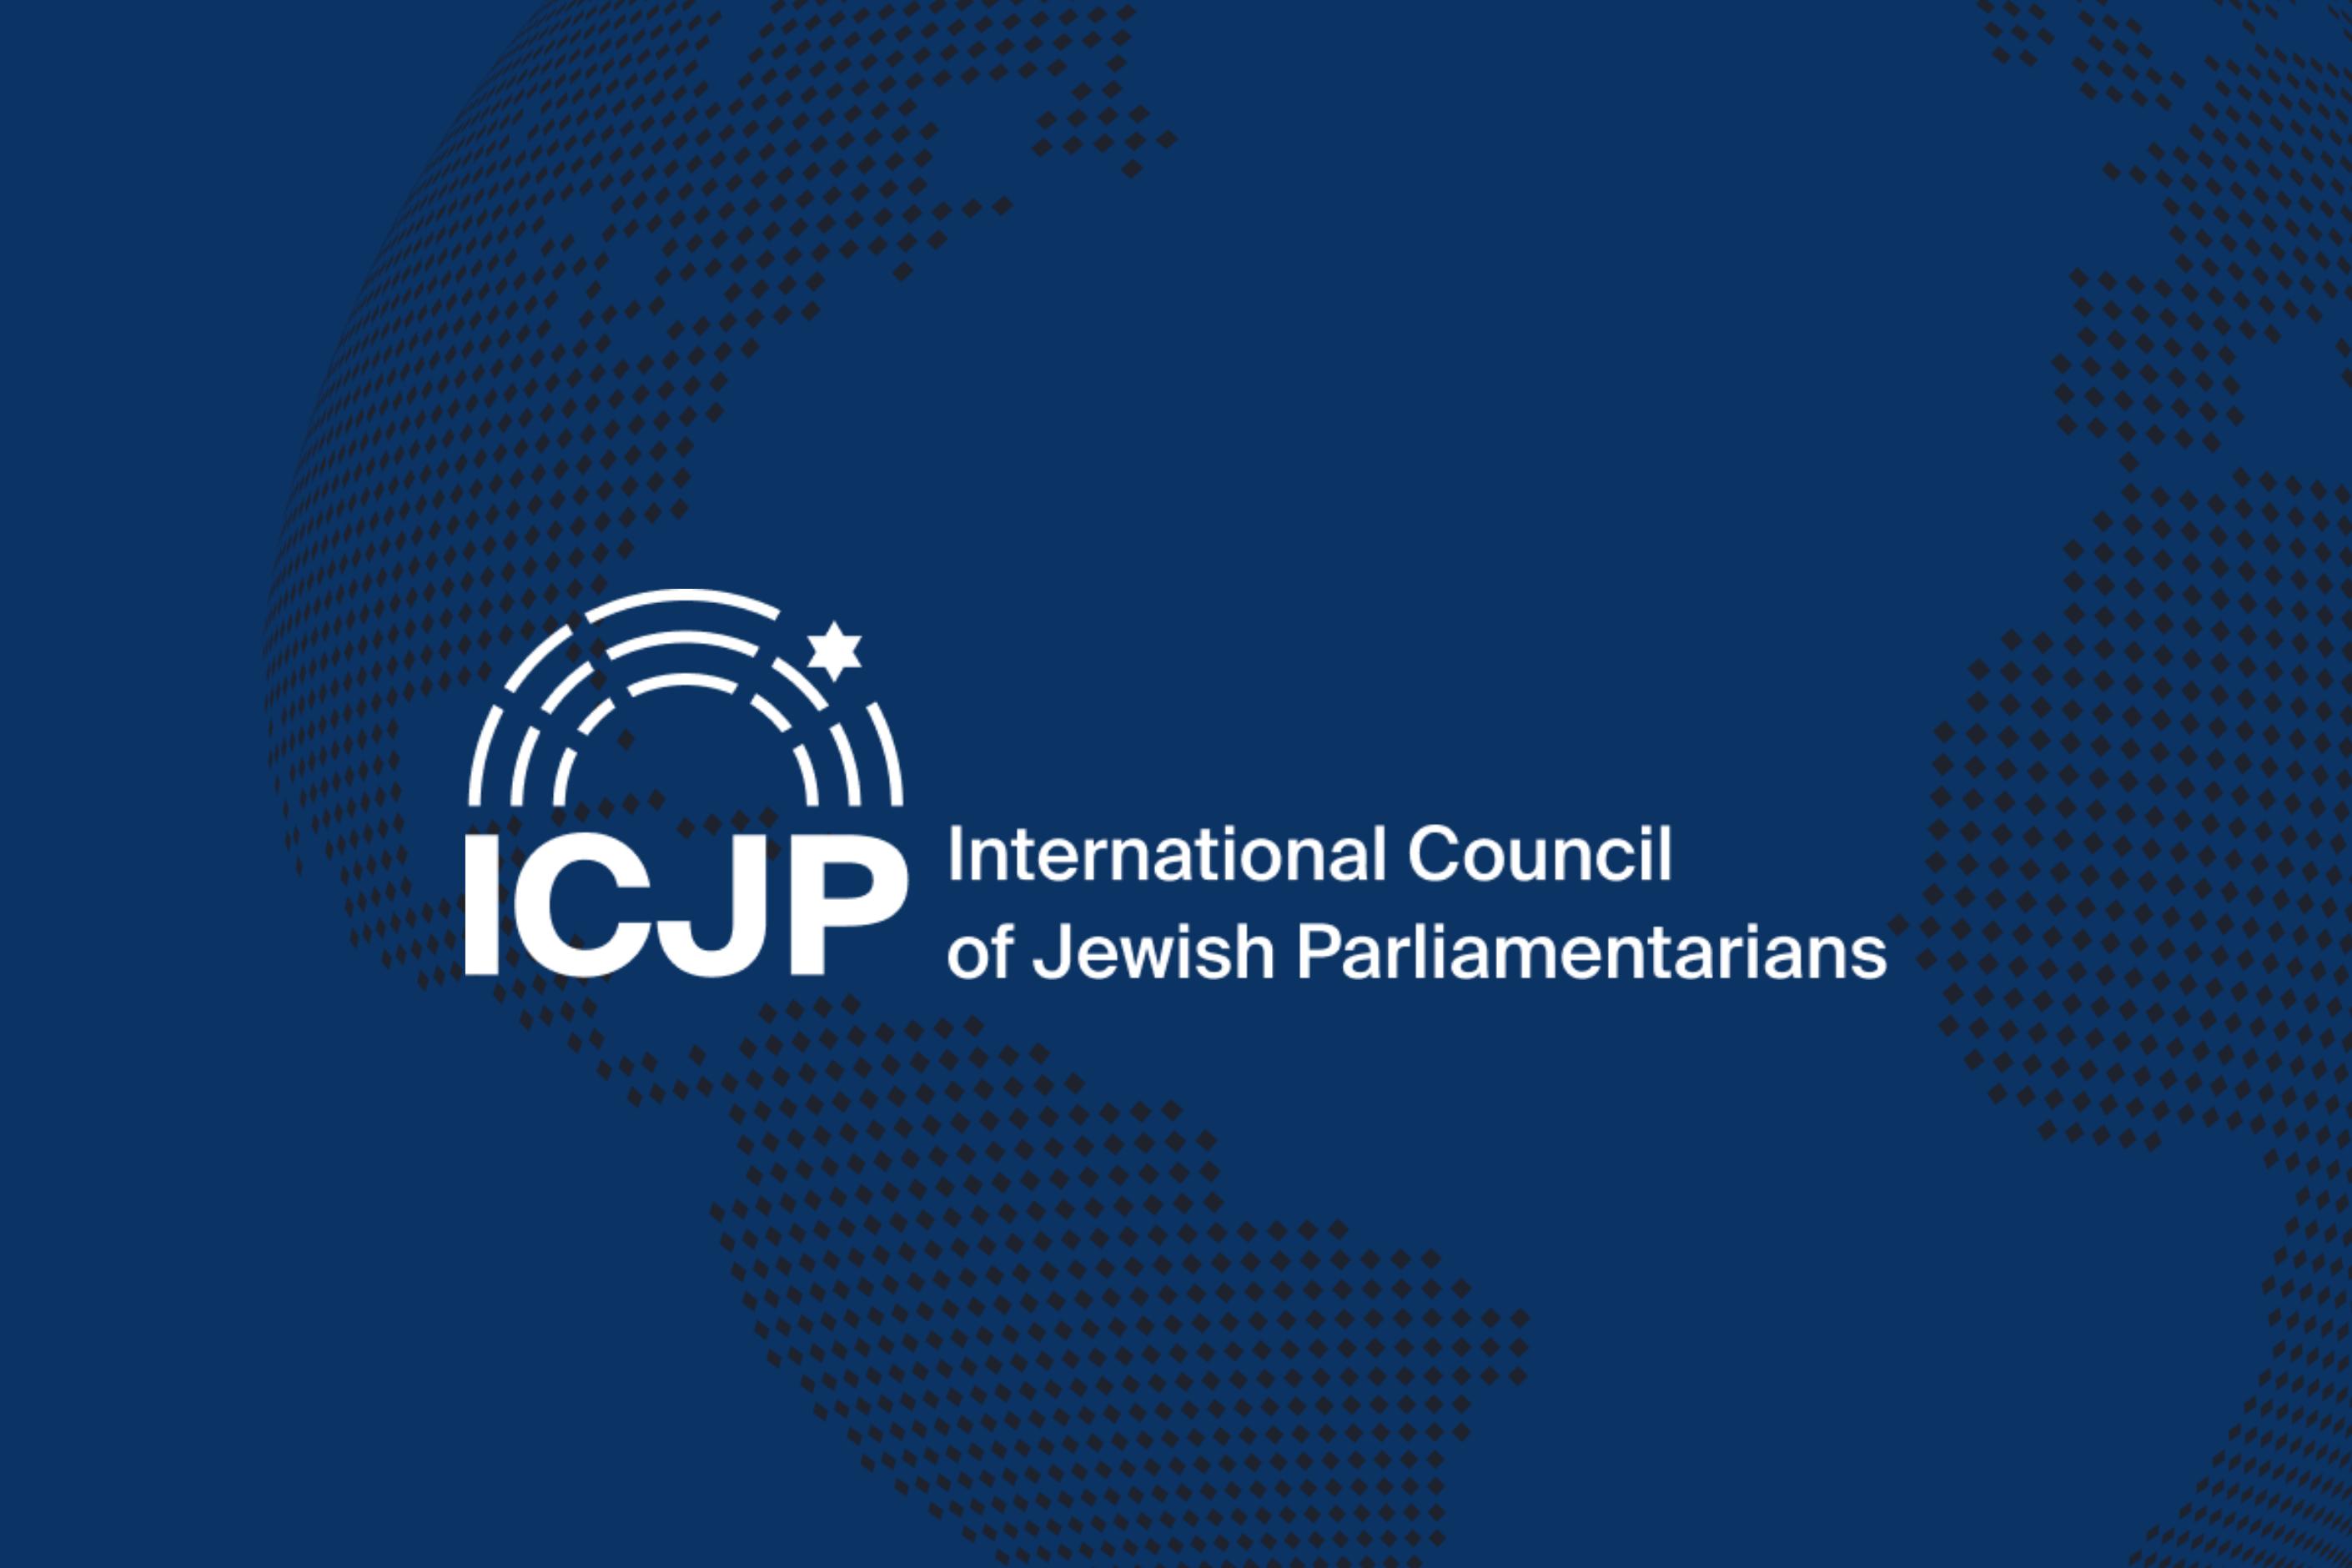 International Council of Jewish Parliamentarians (ICJP)